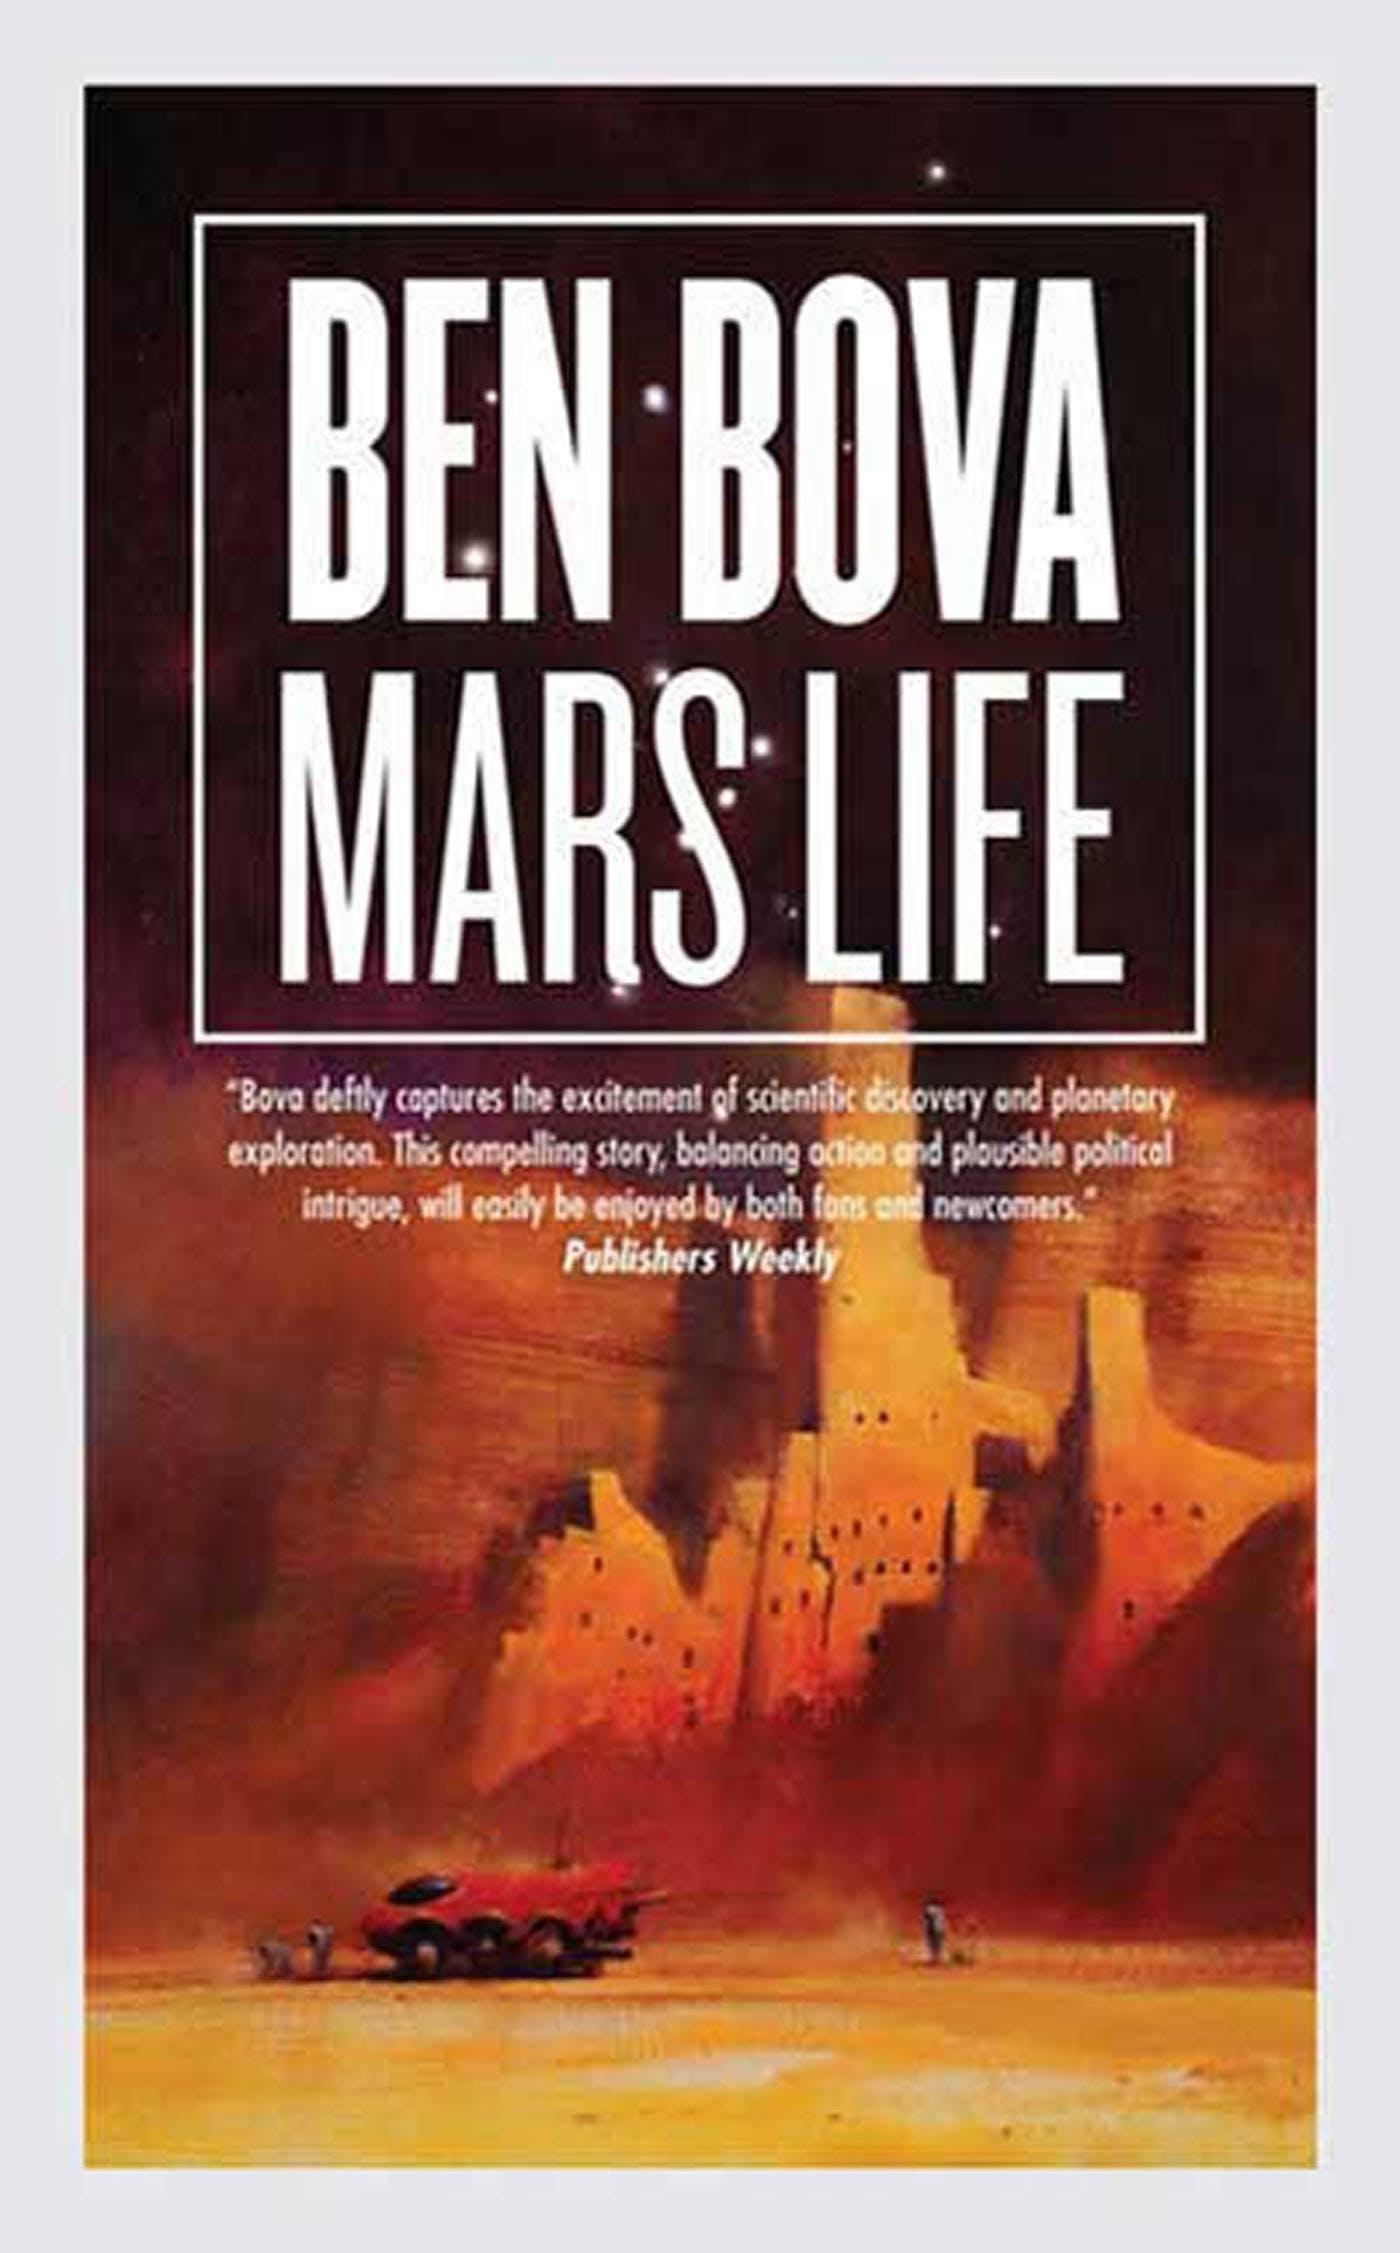 Image of Mars Life